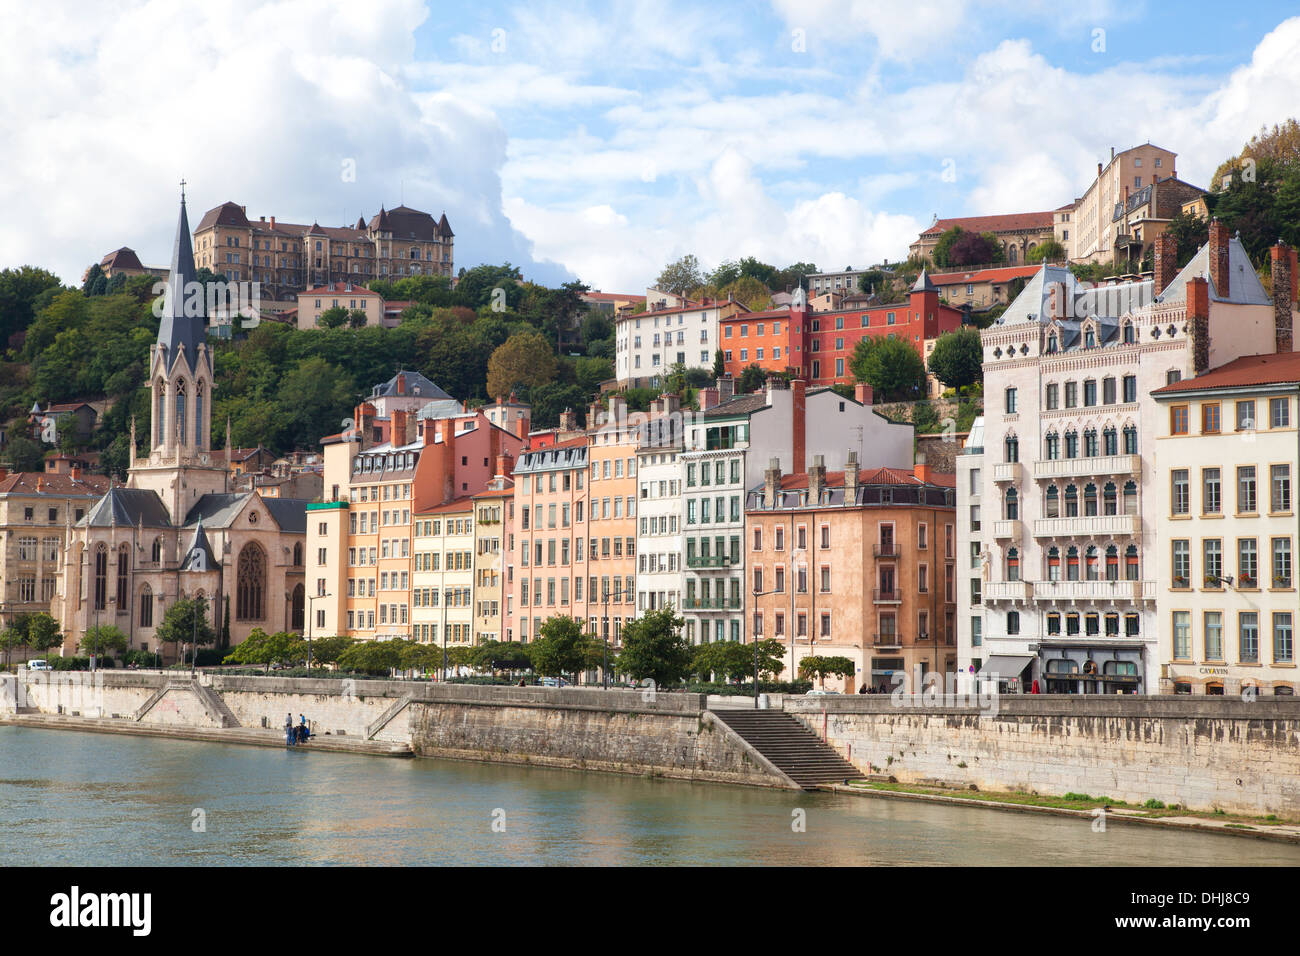 EGLISE SAINT-GEORGES Quai Fulchiron,Lyon,France - Stock Image